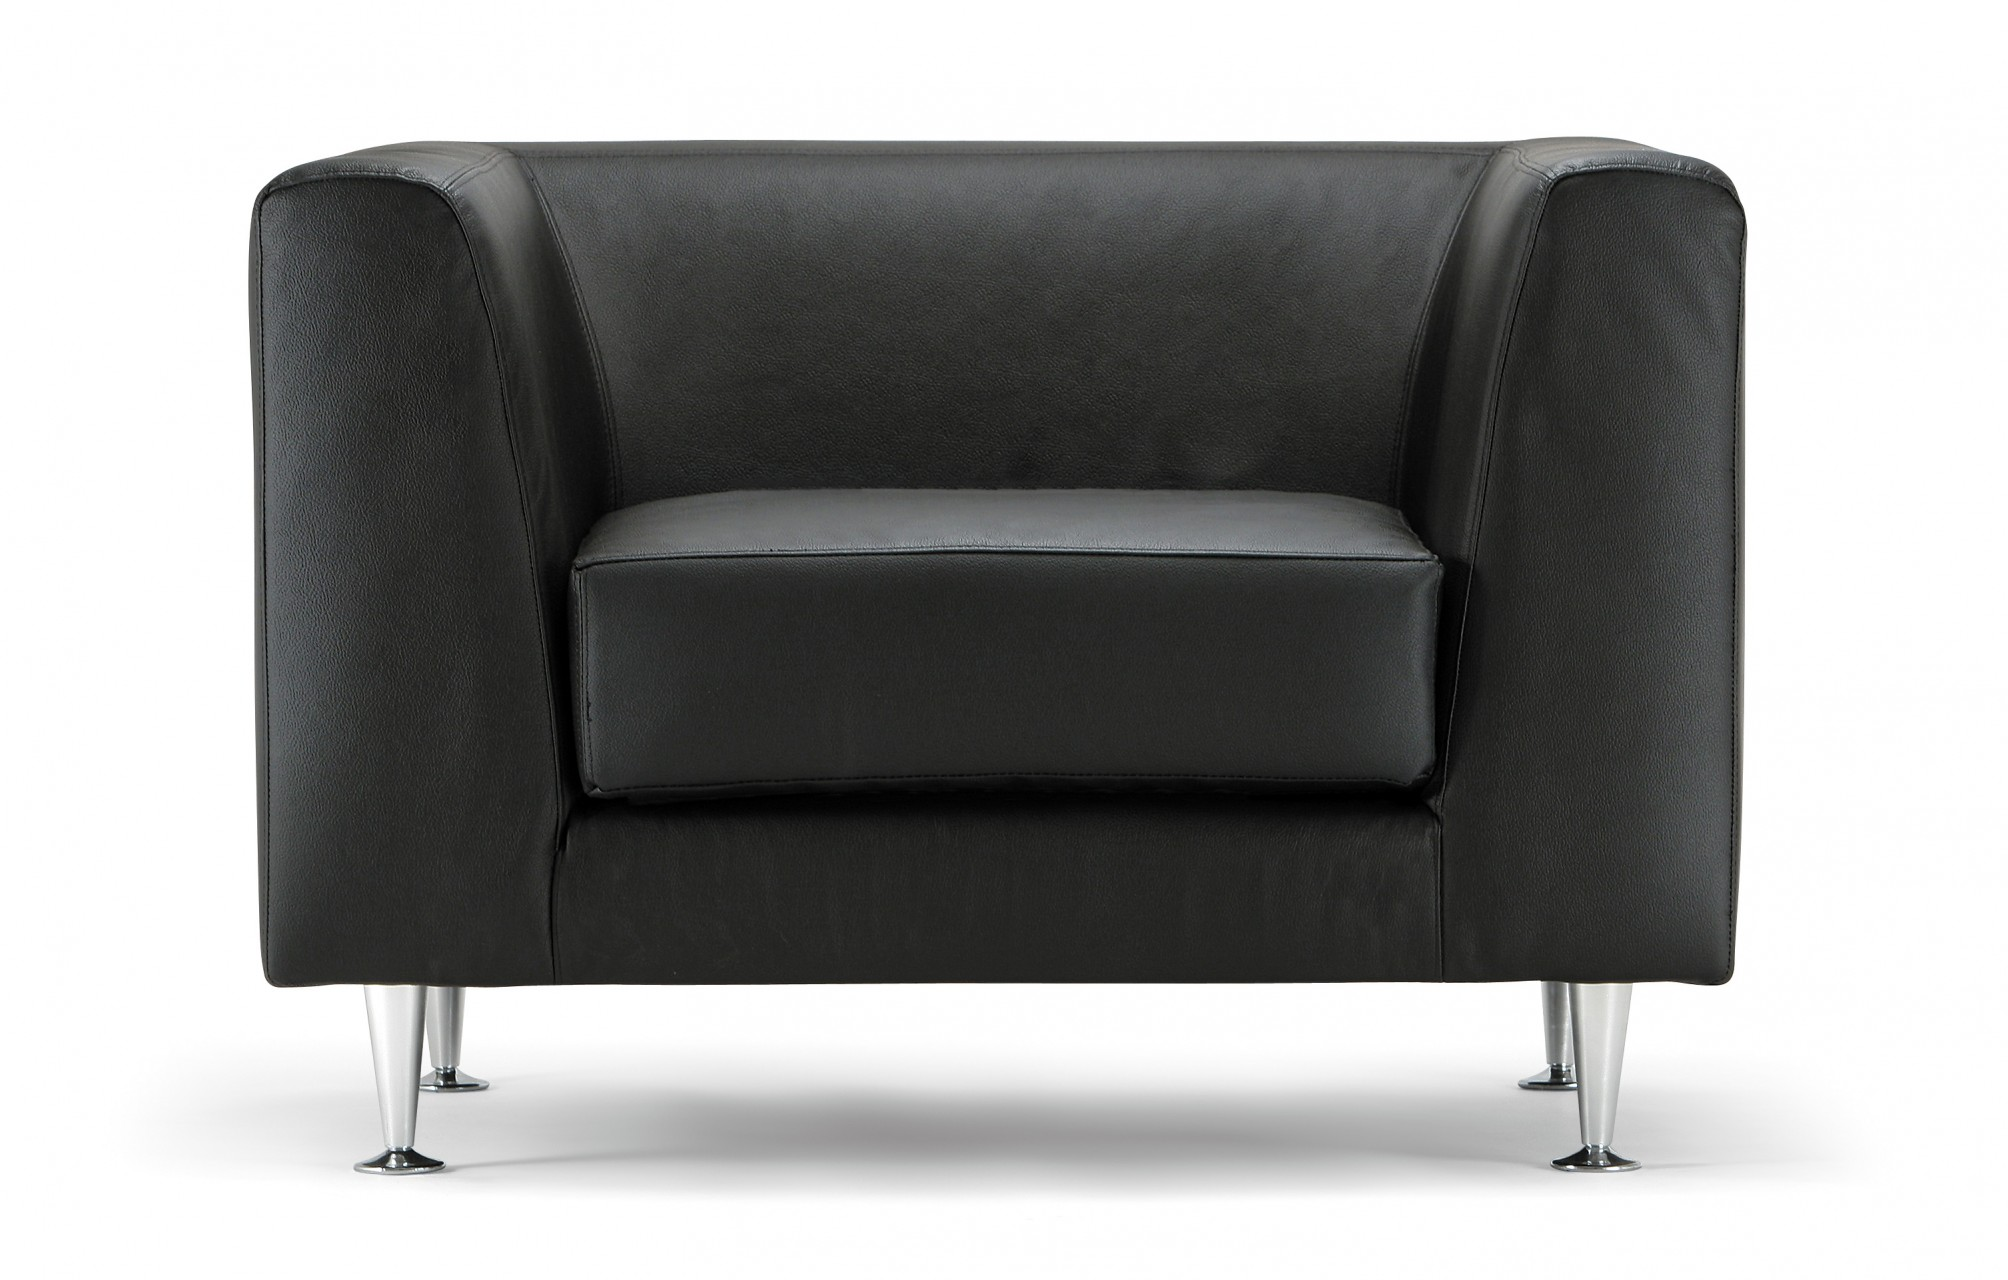 Fauteuil kubo achat fauteuils 549 00 for Canape et fauteuil assorti